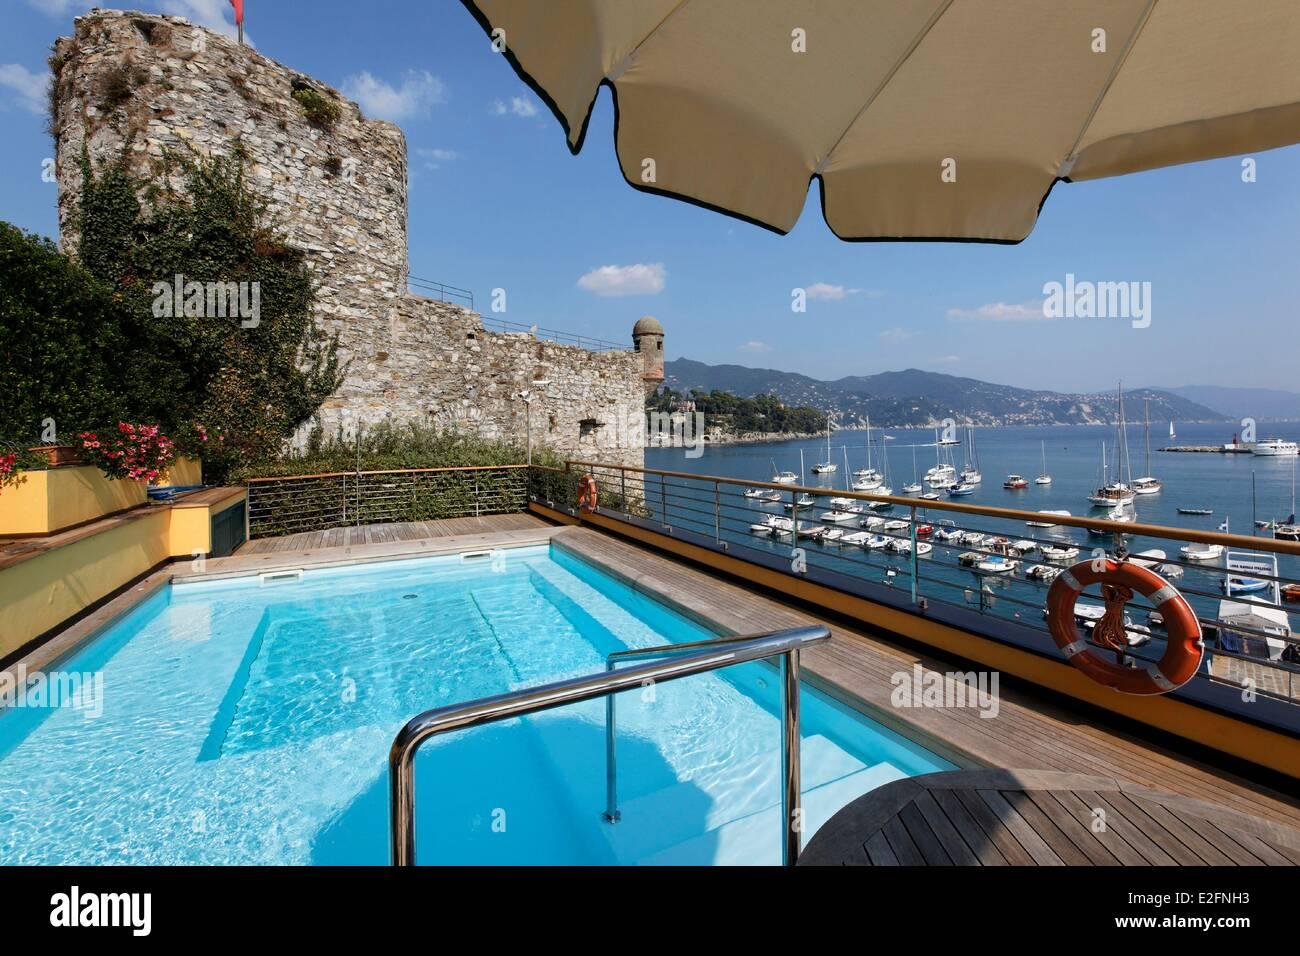 Italy Liguria Santa Margherita di Ligura hotel Laurin rooftop pool - Stock Image